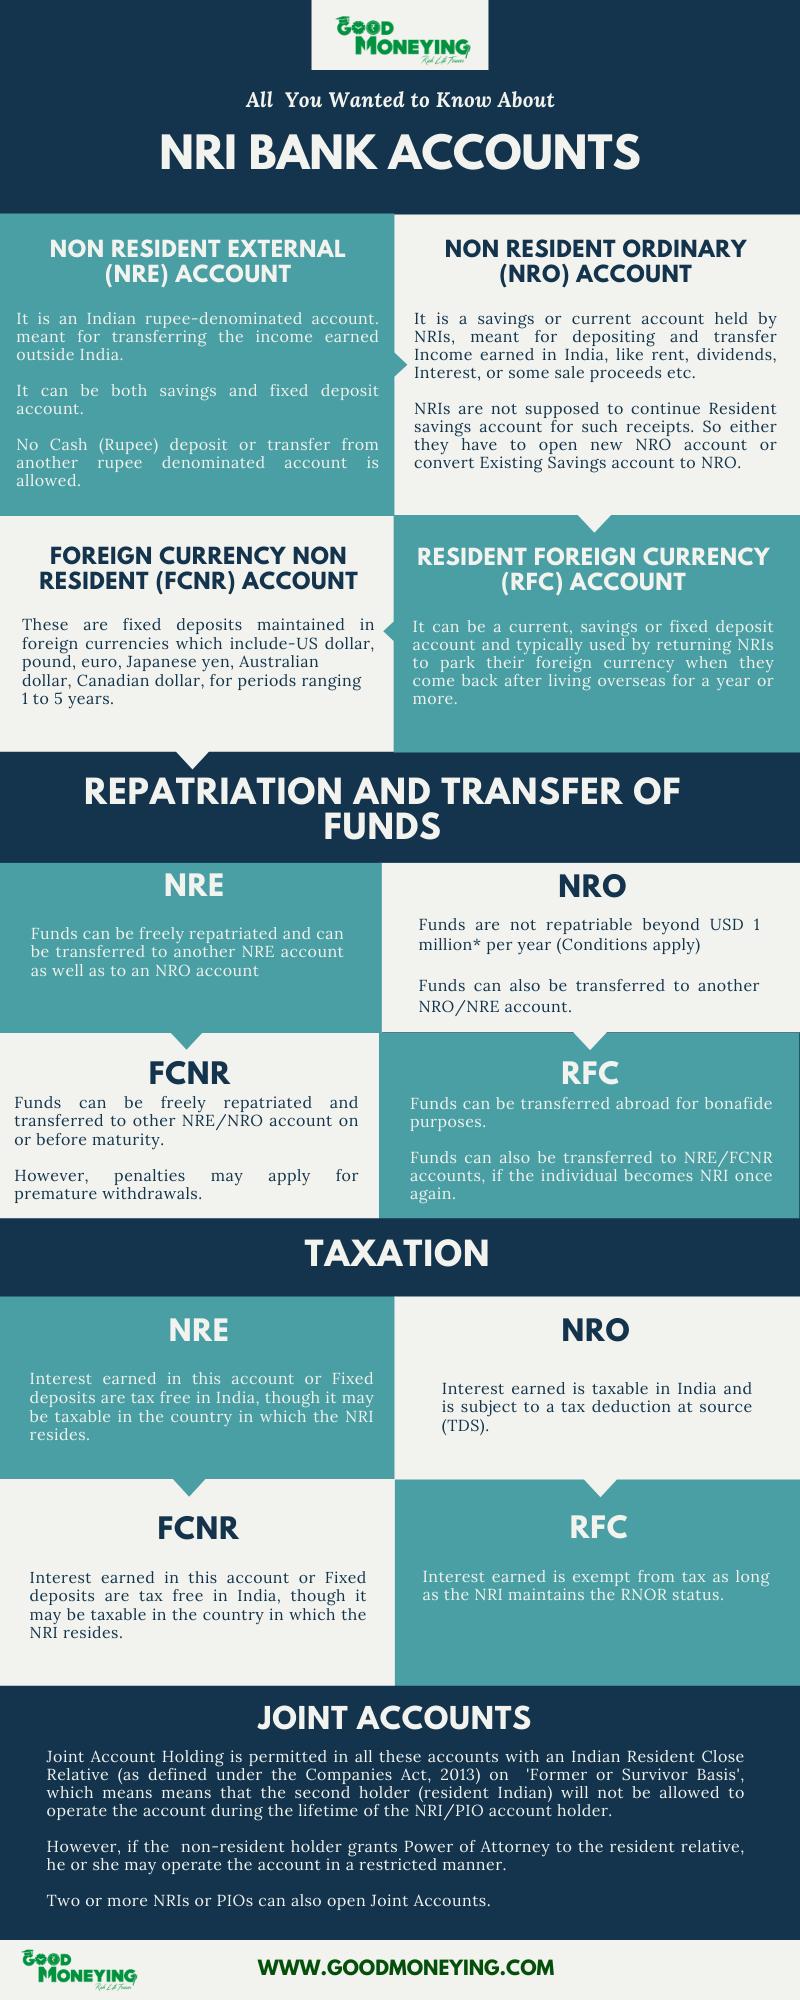 Types of NRI Bank Accounts